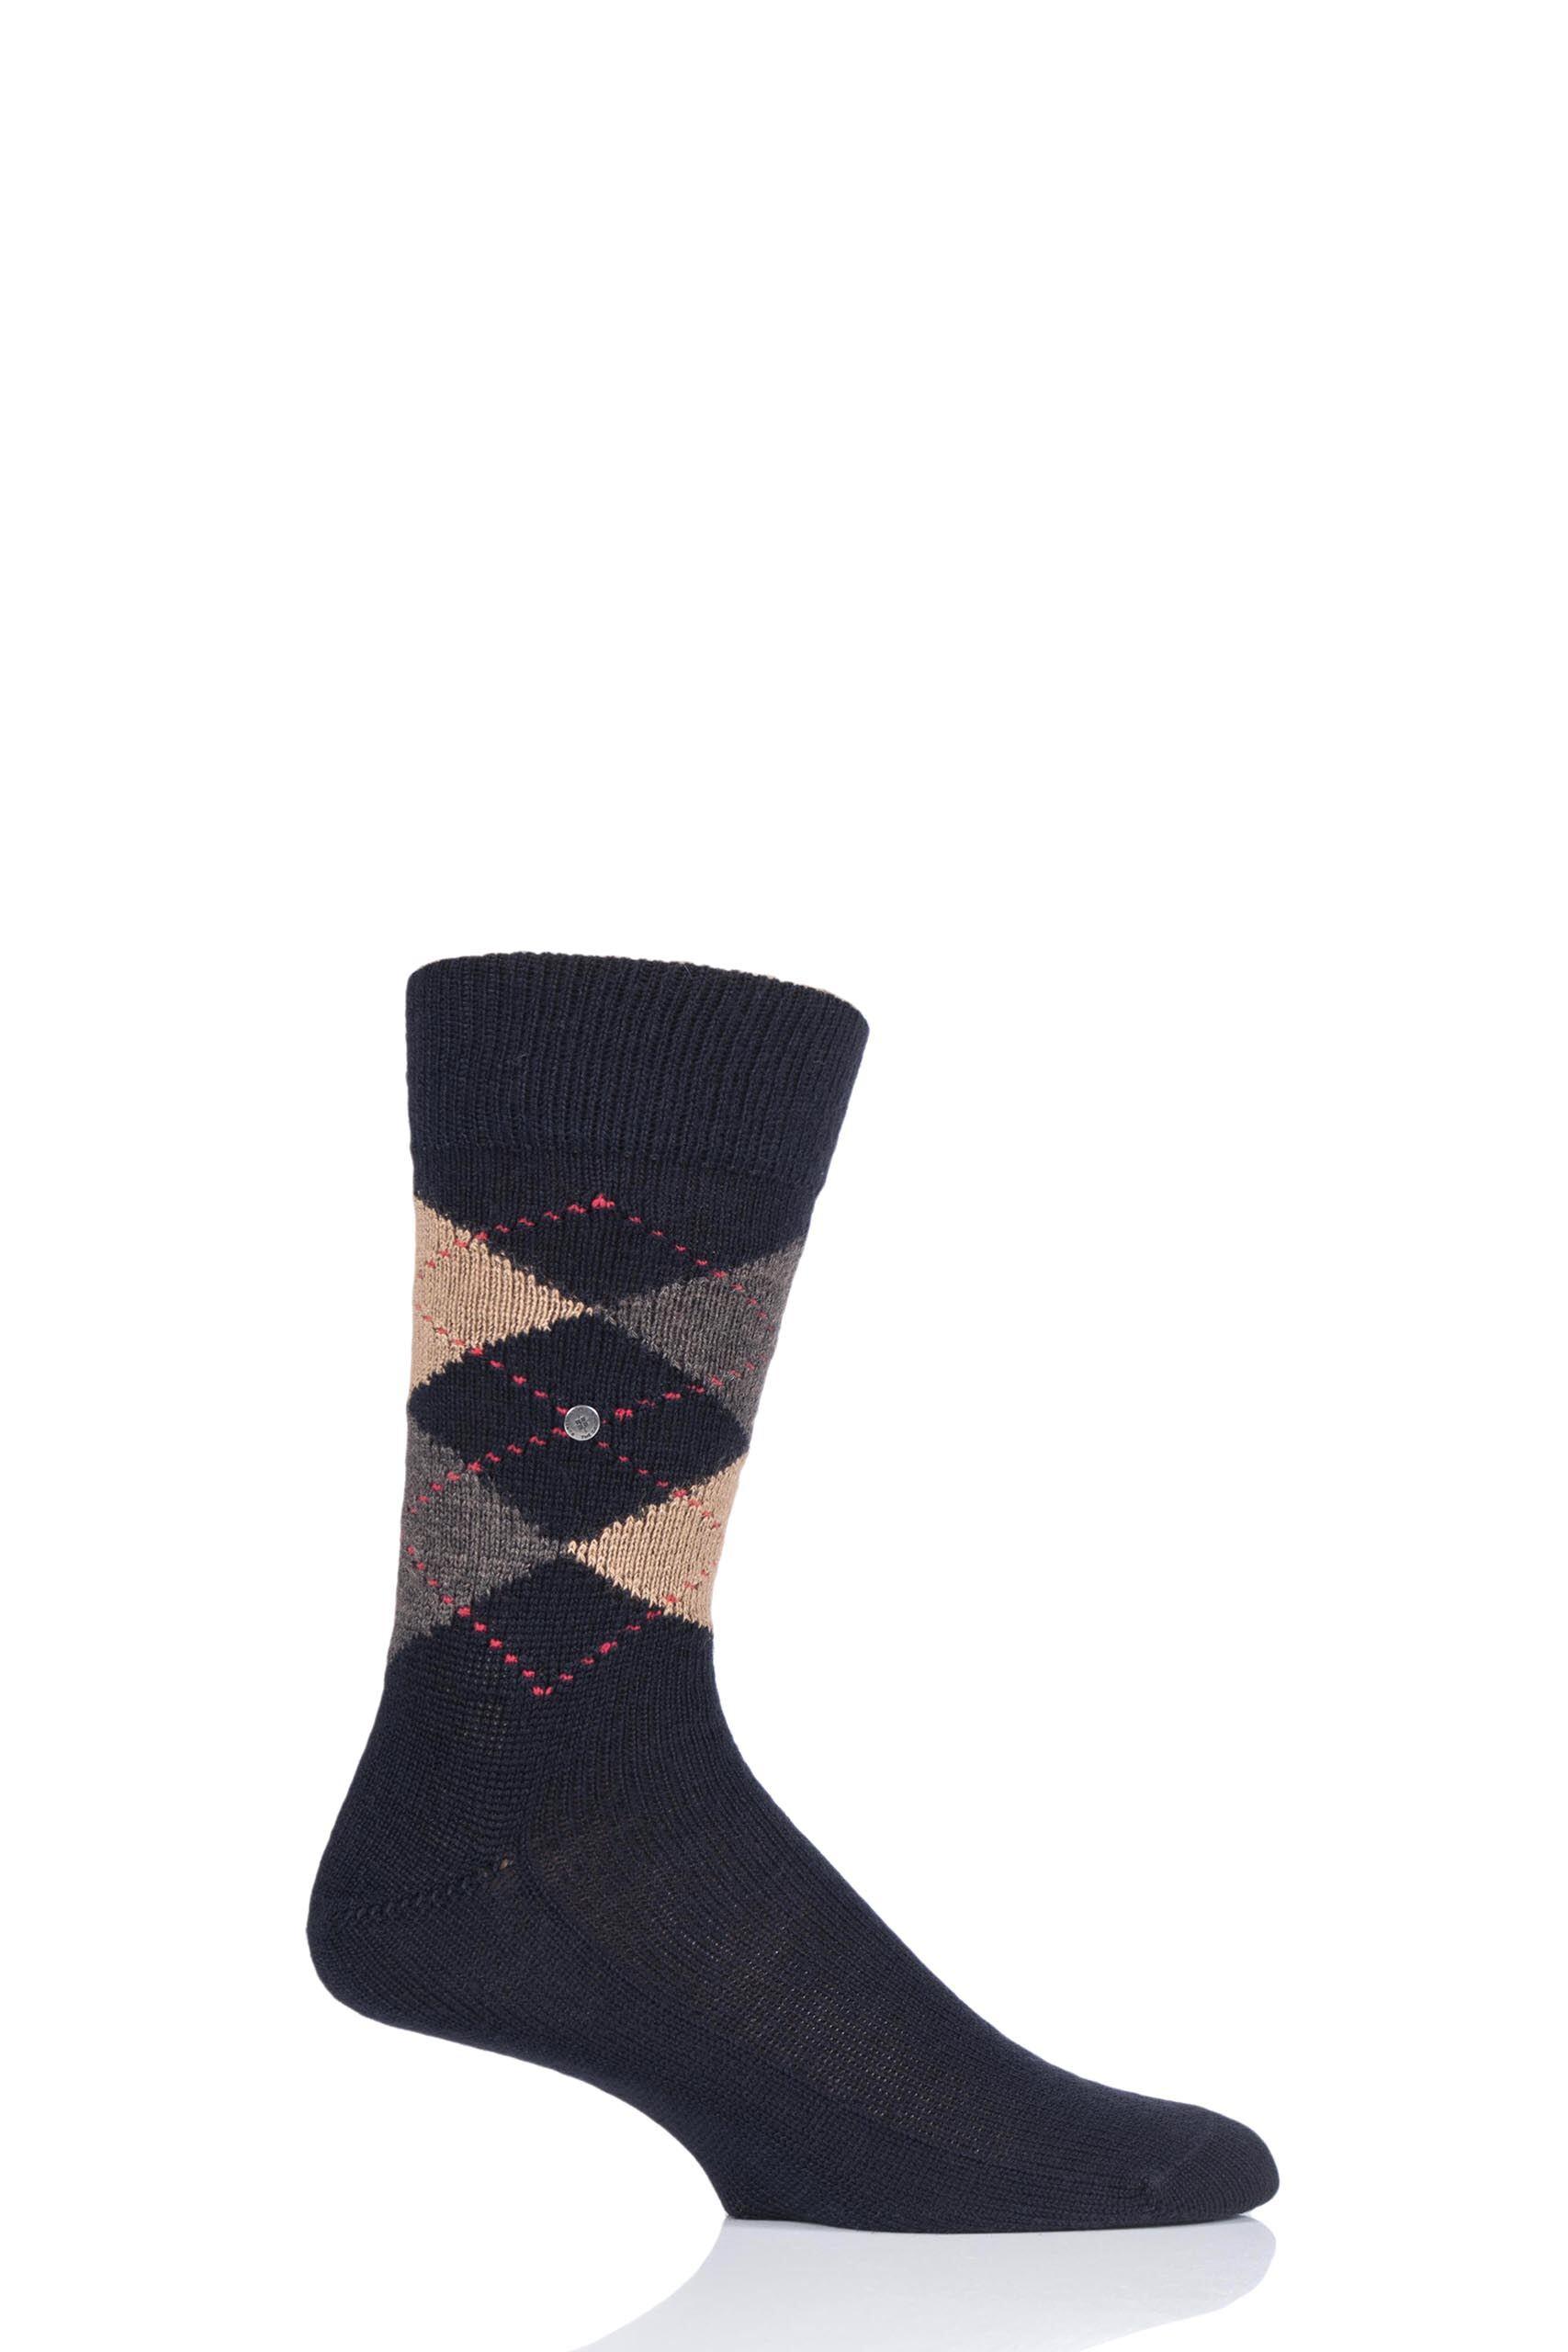 Image of 1 Pair Black / Brown Preston Extra Soft Feeling Argyle Socks Men's 11-14 Mens - Burlington